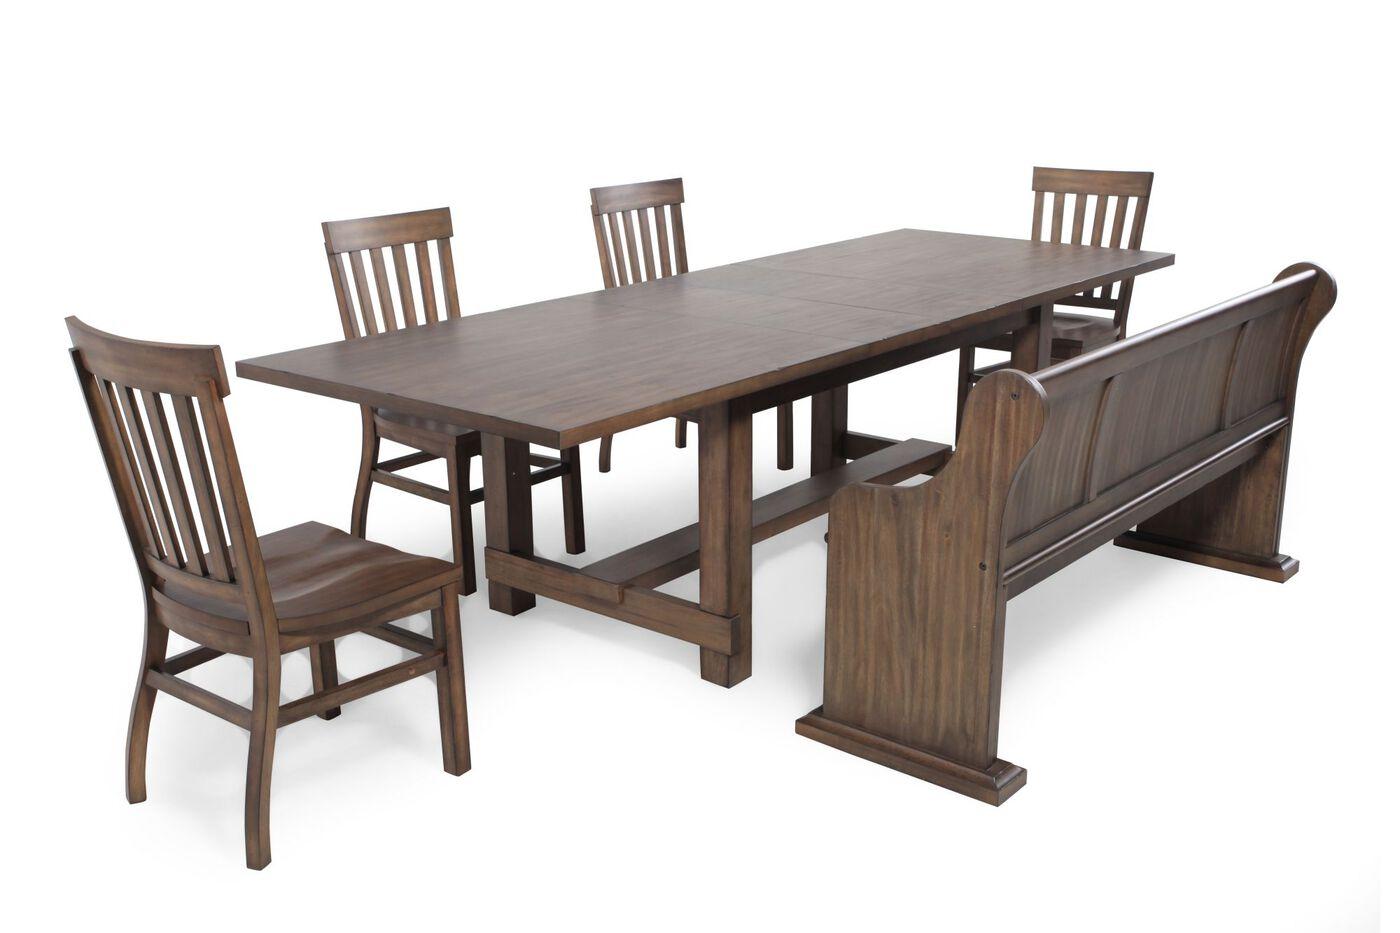 magnussen home karlin six piece dining set - Magnussen Dining Room Furniture